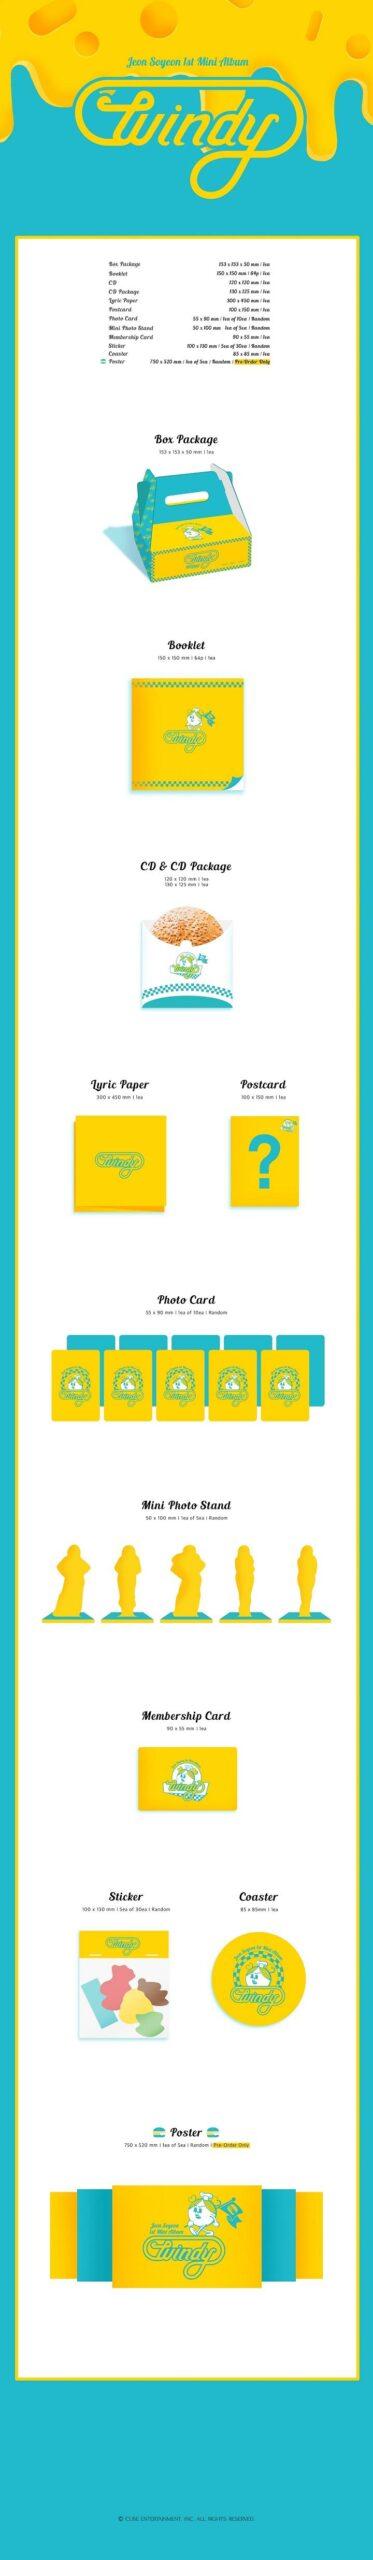 1st Mini Album de JWON SO YEON GI DLE Windy Poster 1